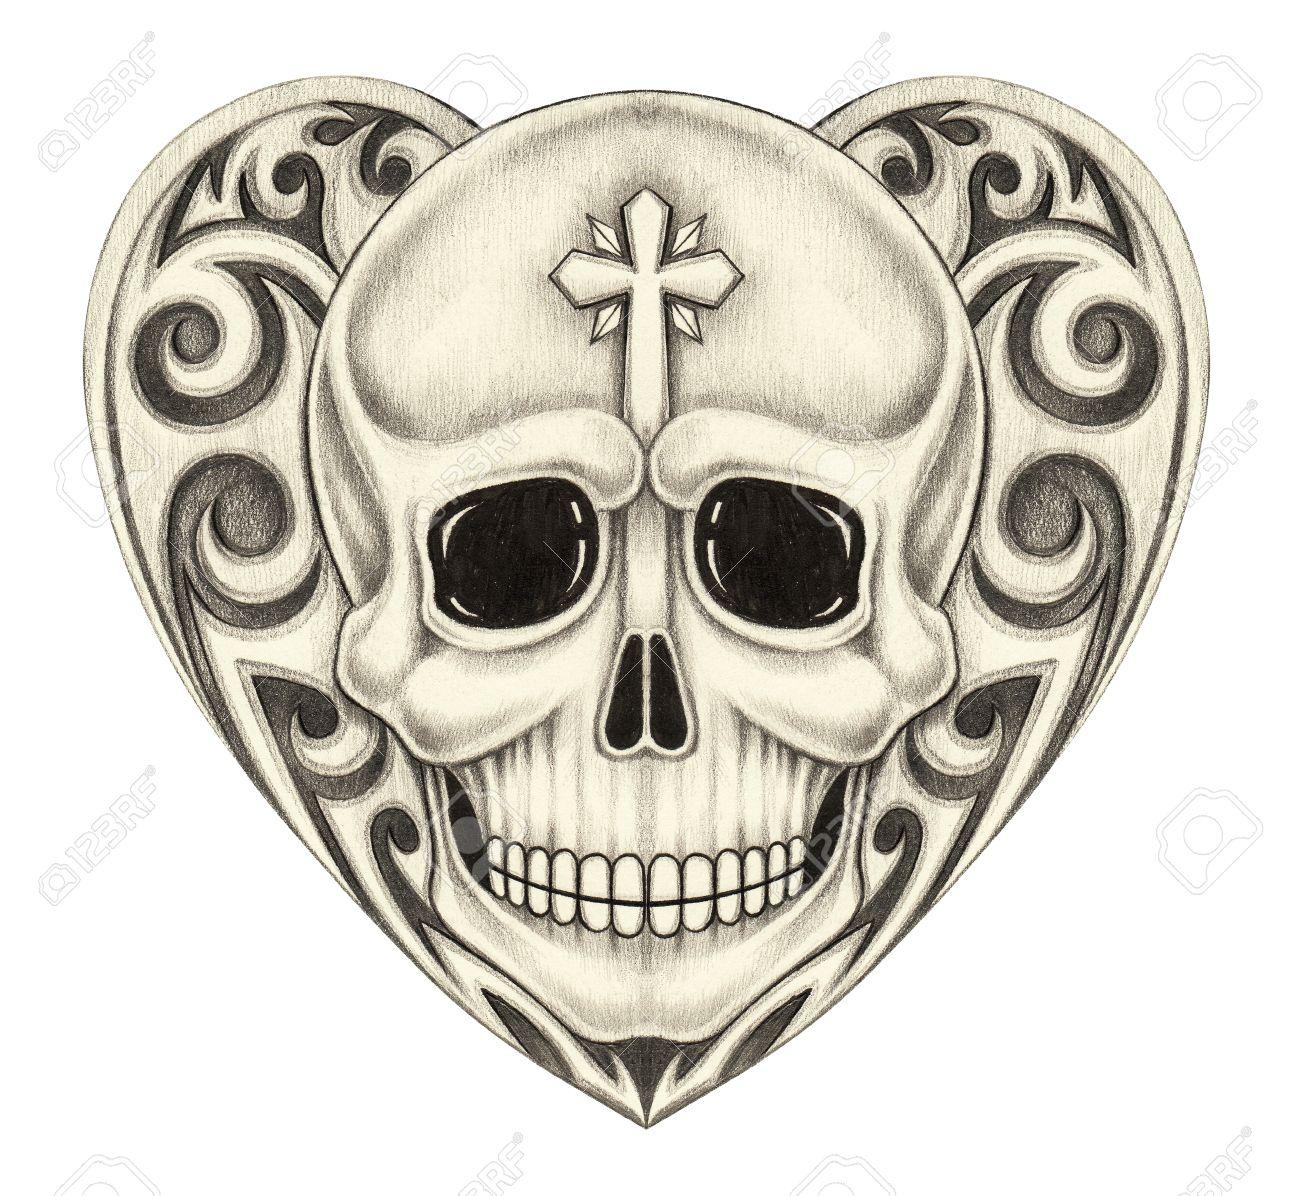 Tattoo Pencil Art Design Images